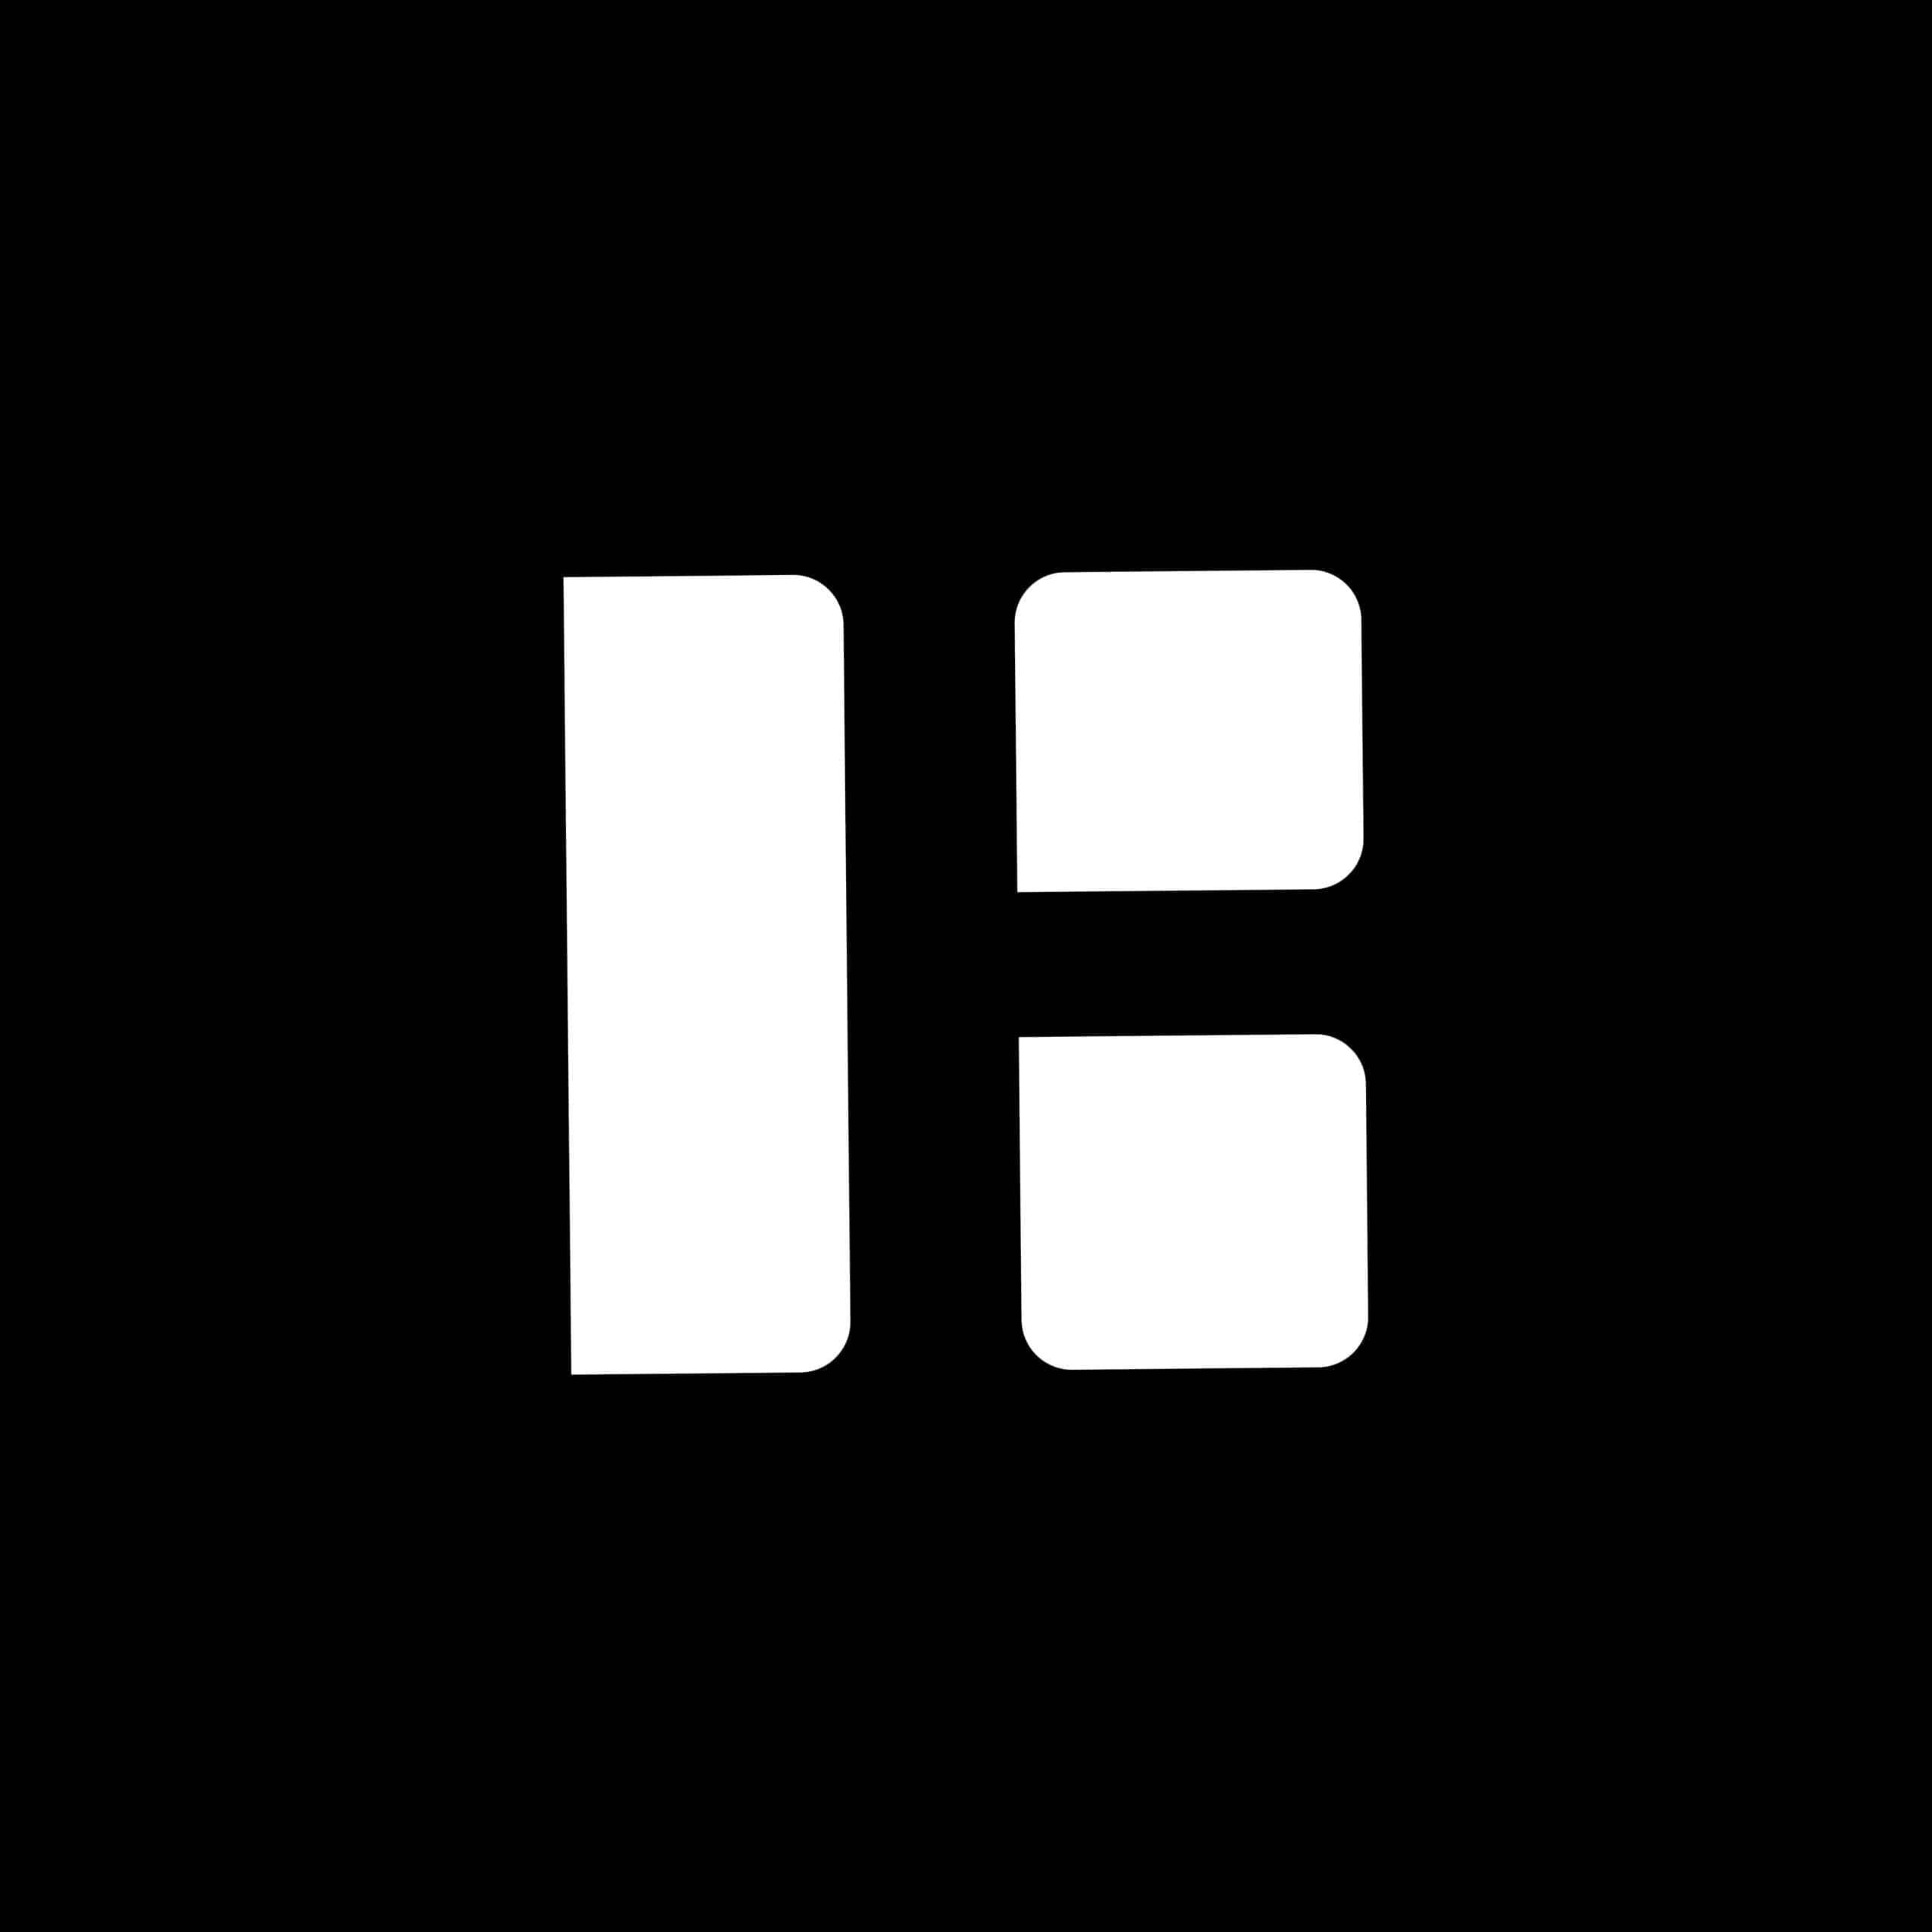 Stellen_Design_Harvey_esquire_Branding-02